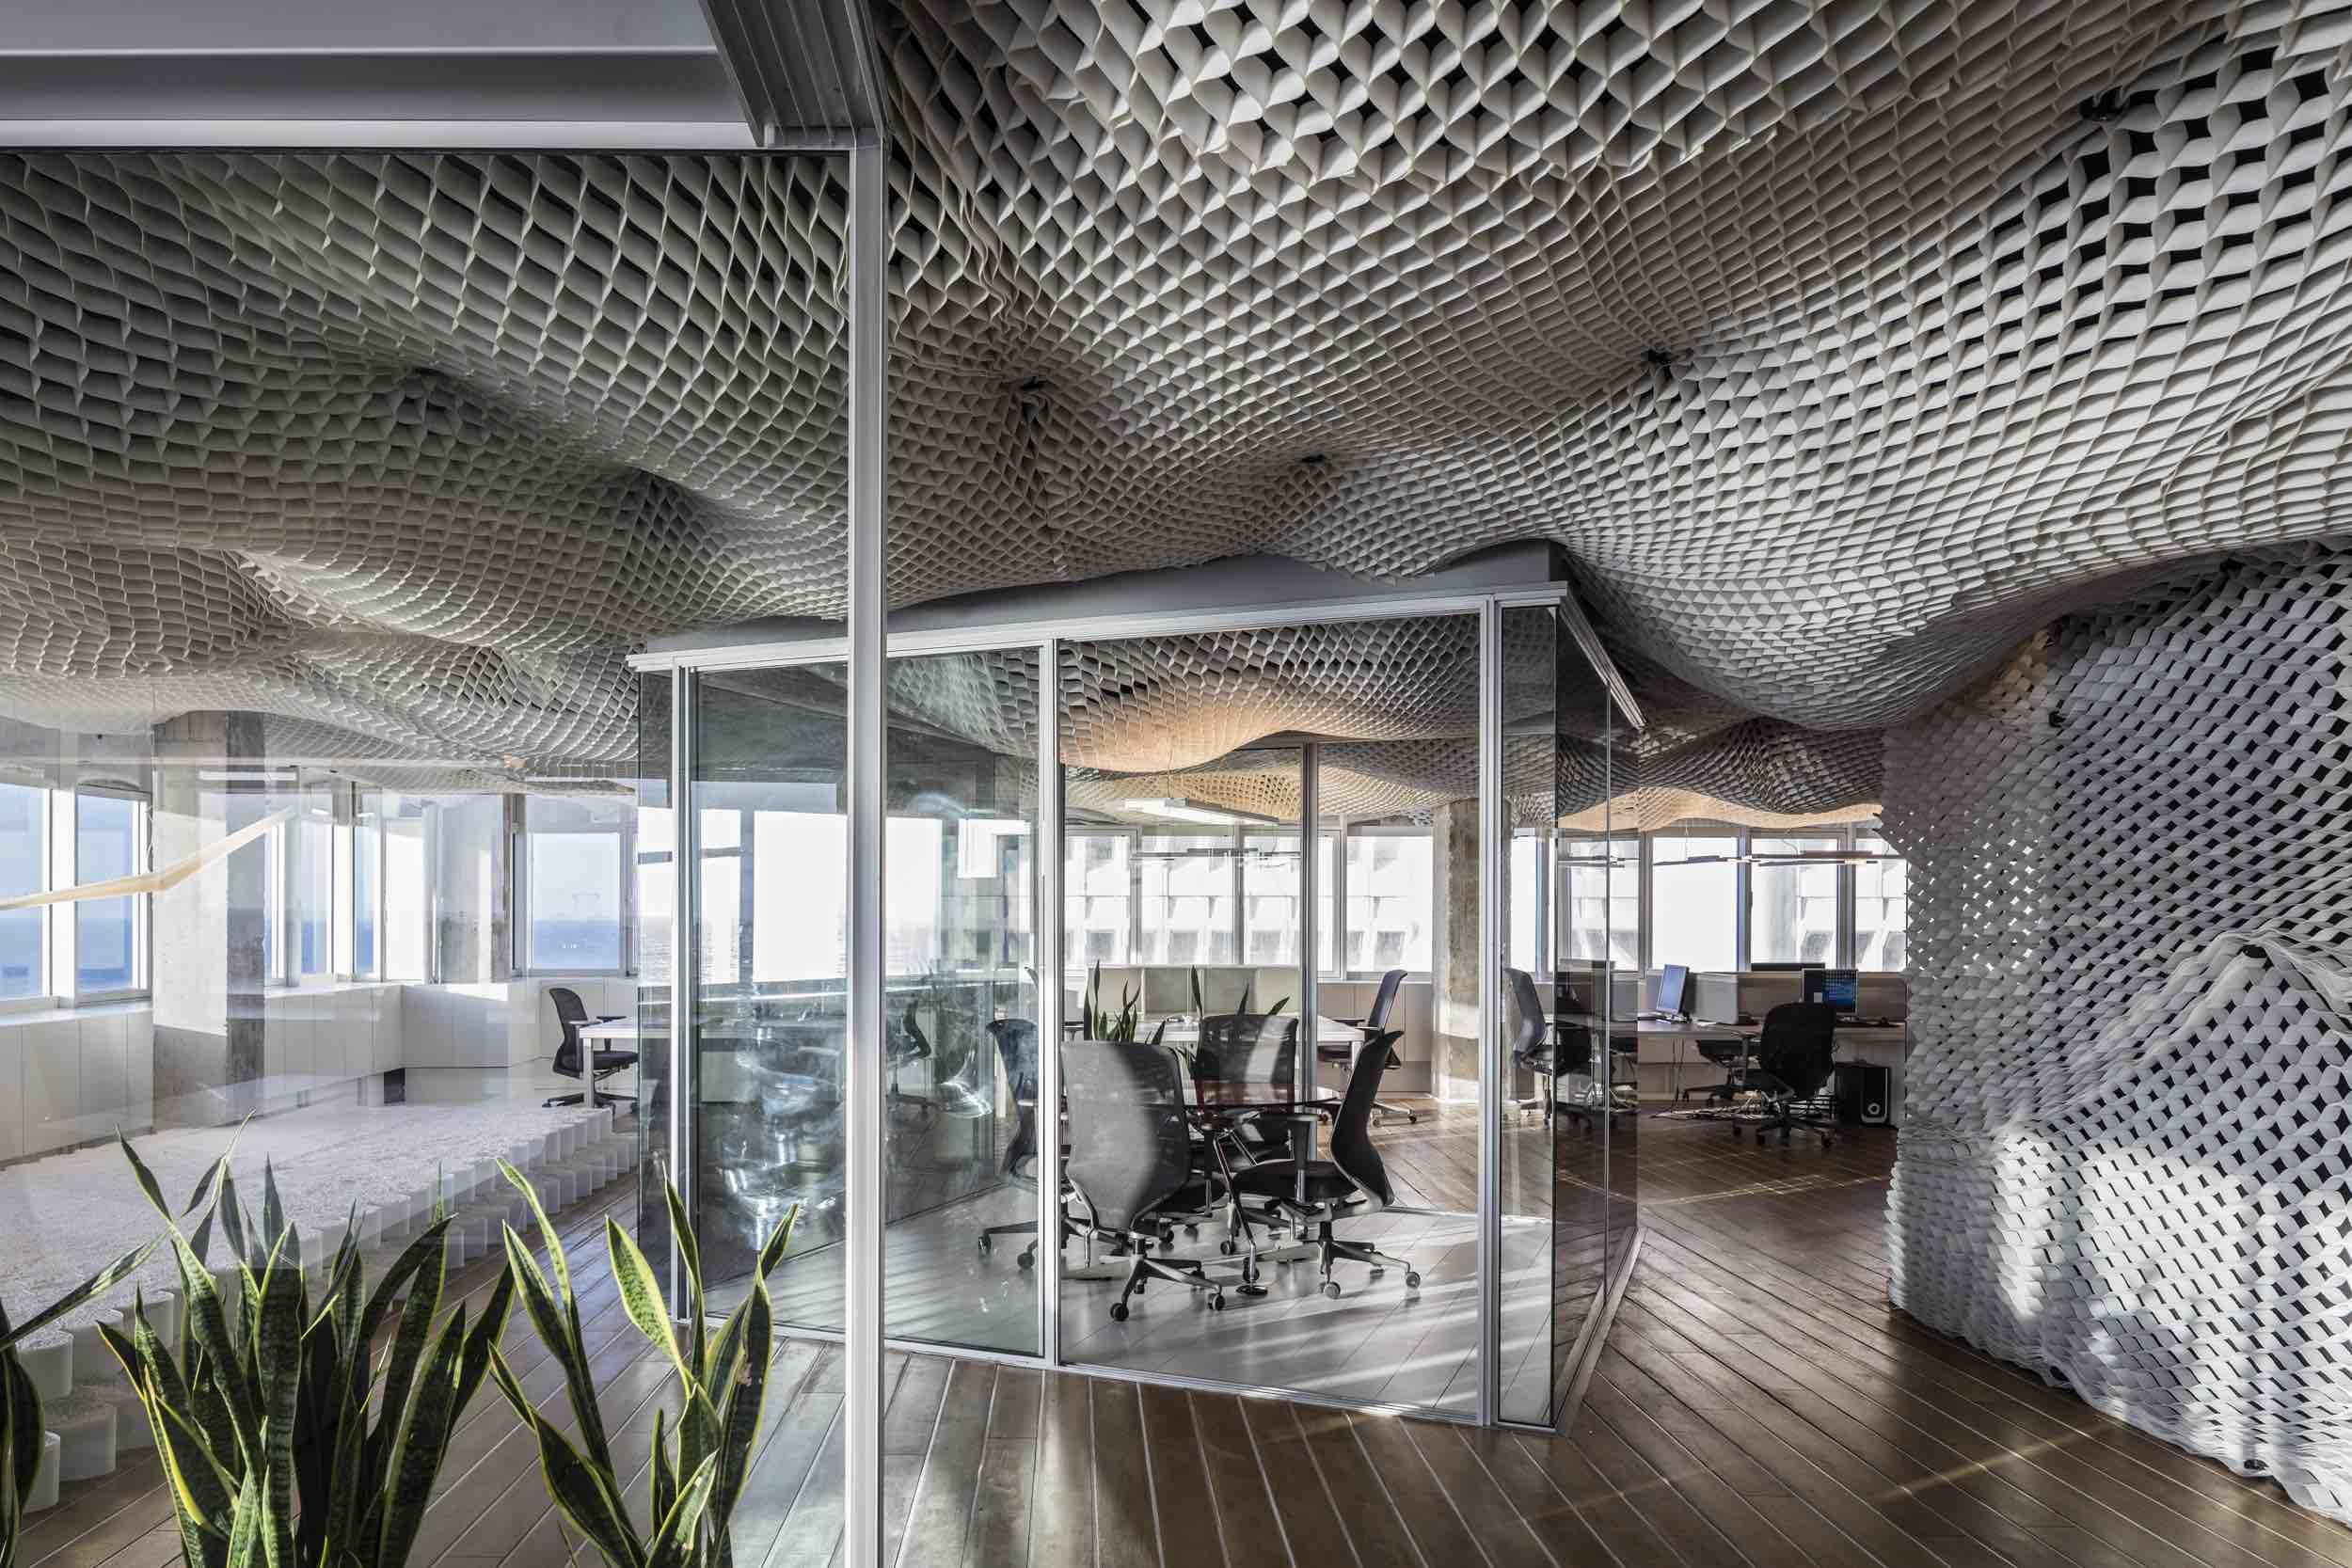 Photo courtesy Paritzki & Liani Architects